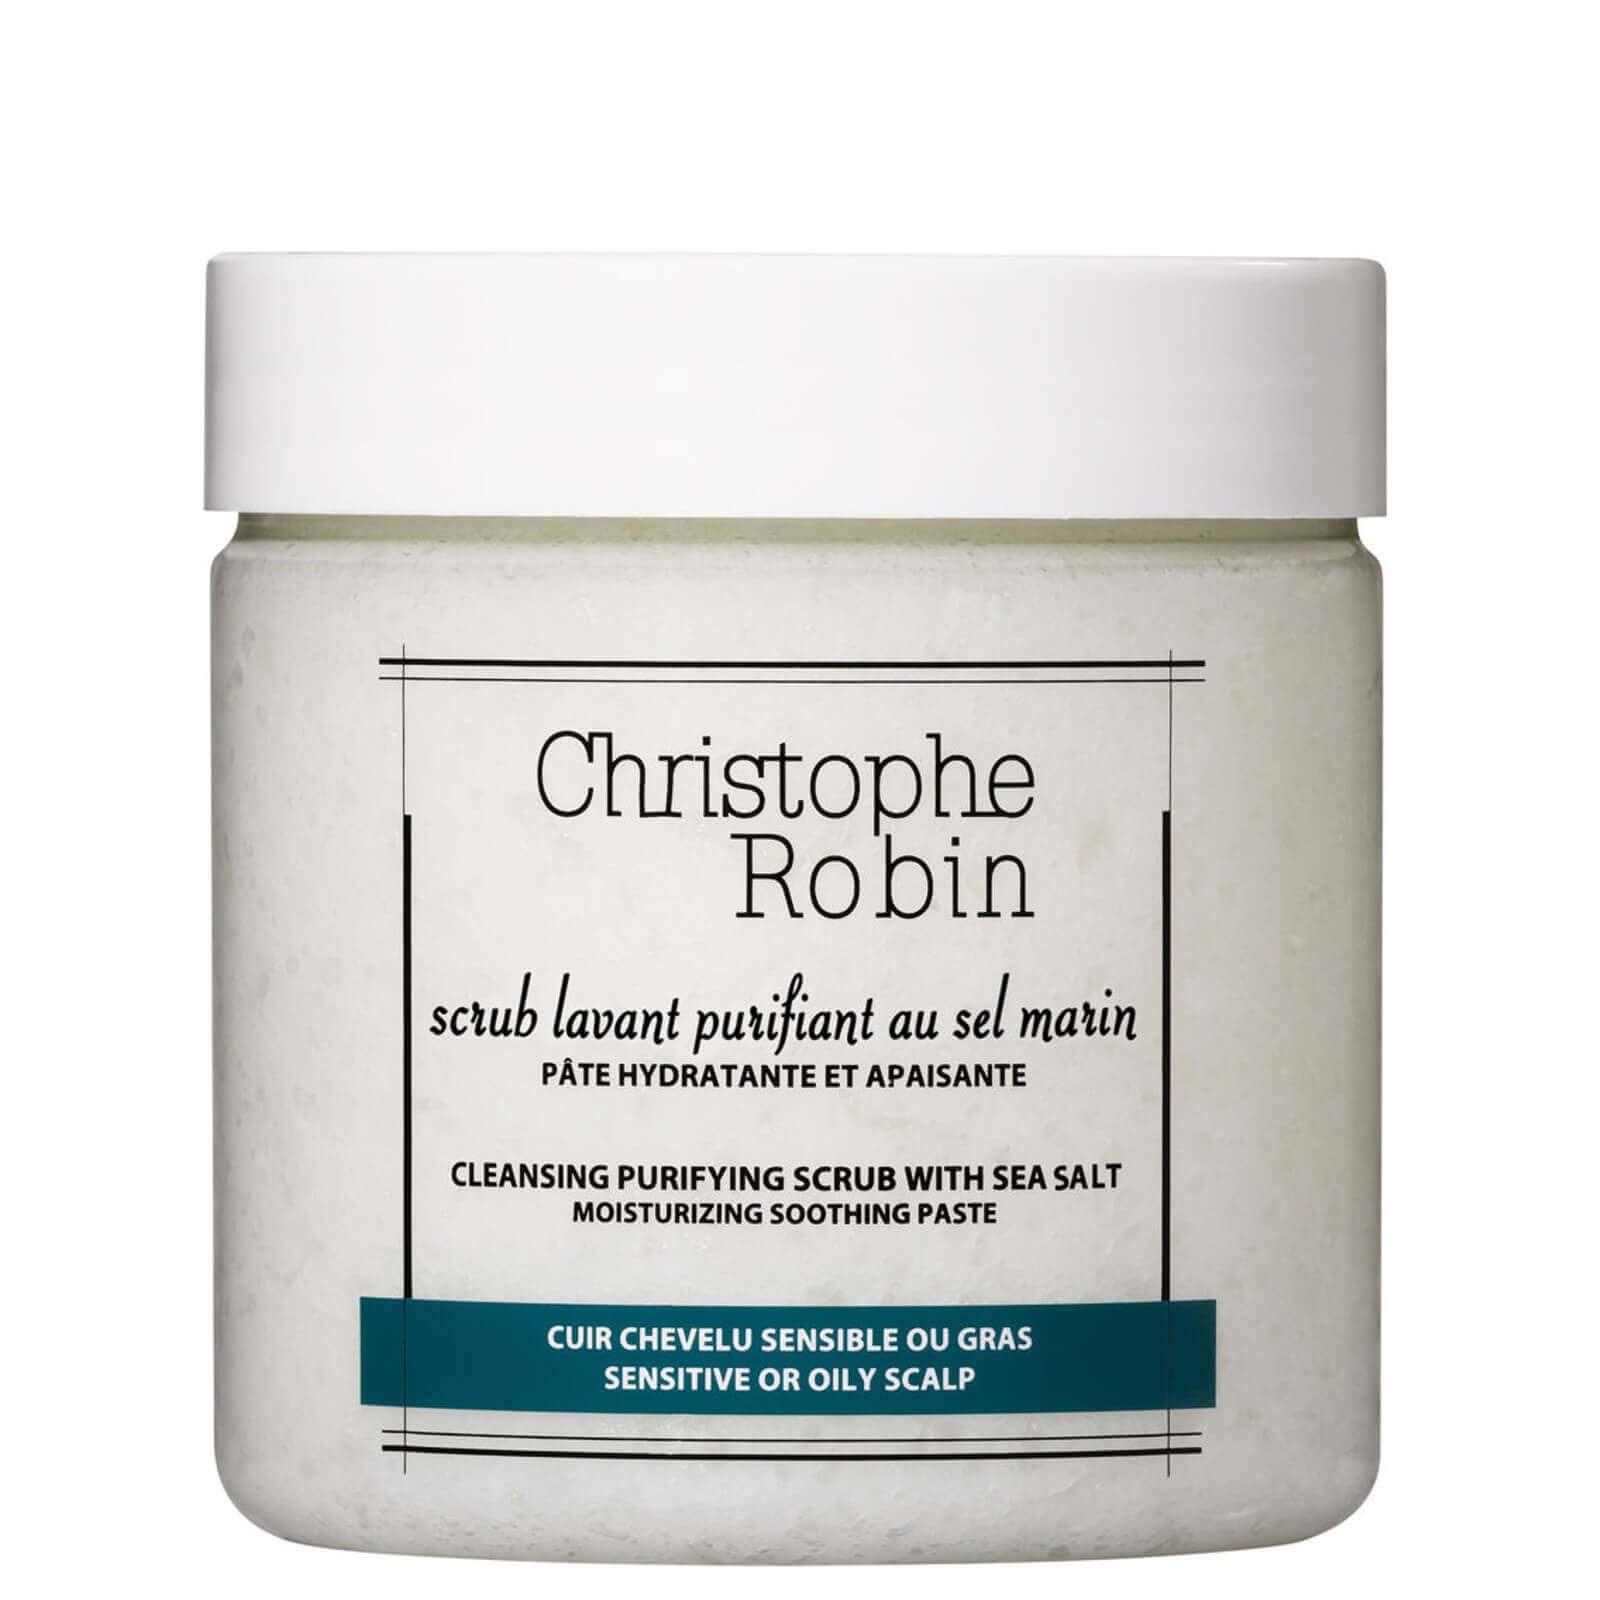 Christophe Robin 海盐洗发膏